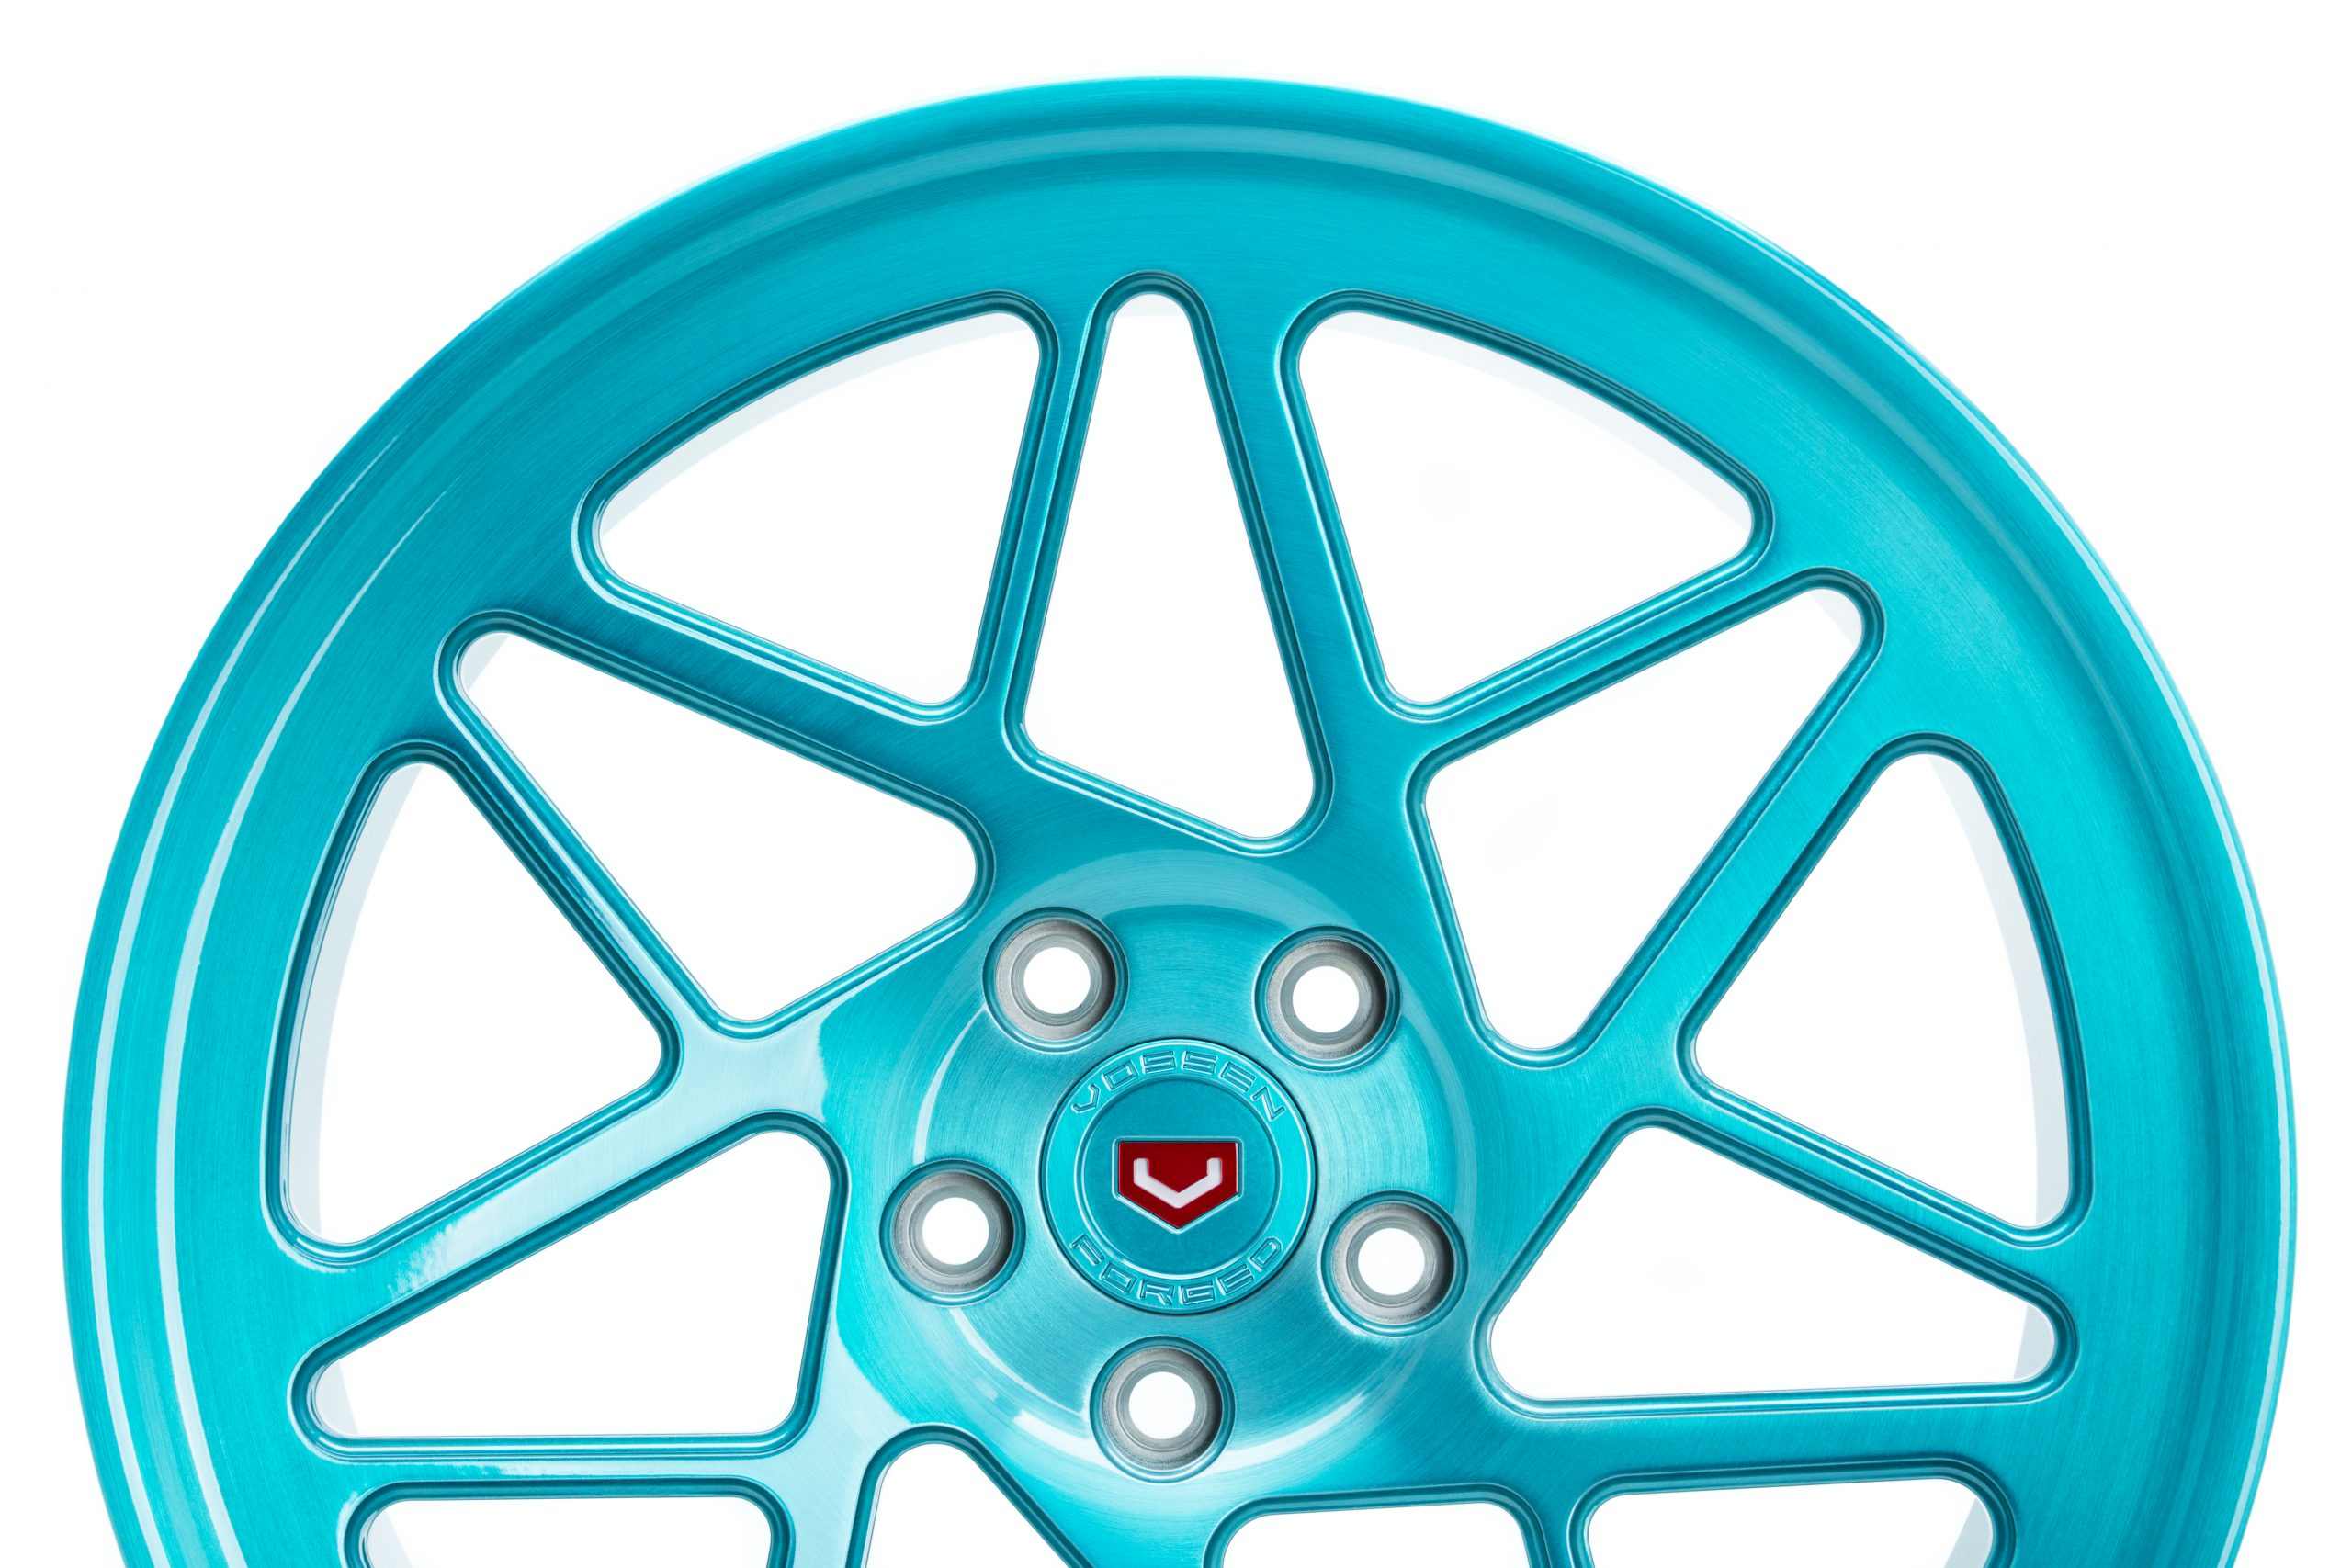 vossen-forged-lc-109t-wheel---c21-deco-teal---lc-series----vossen-wheels-2018--1005_28472075428_o